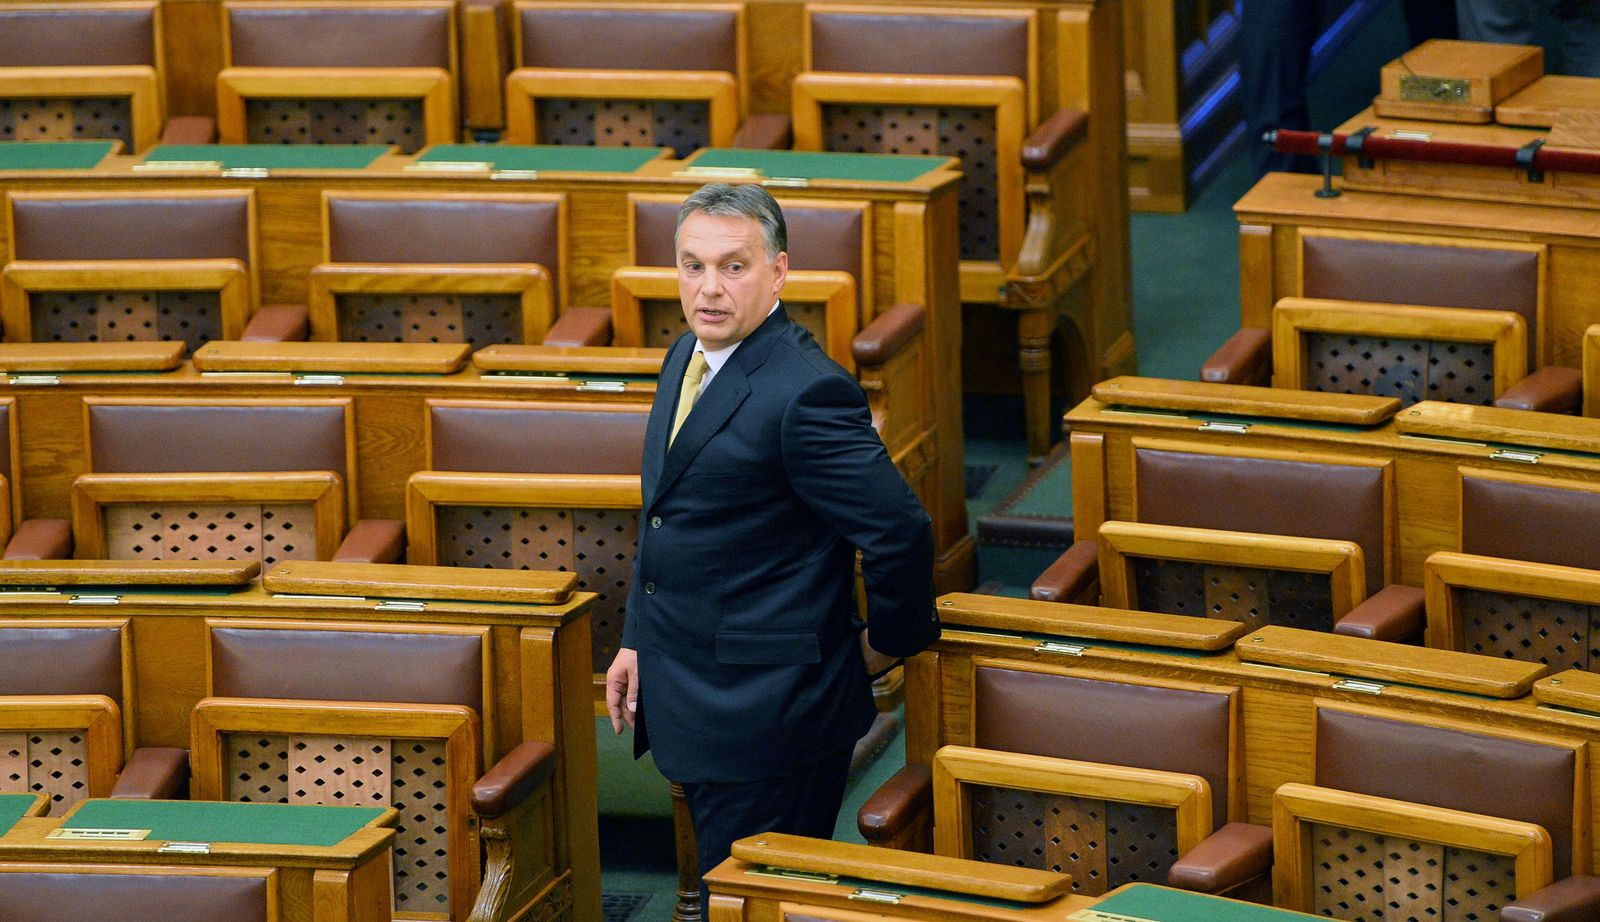 HUNGARY-POLITICS-PARLIAMENT-ORBAN